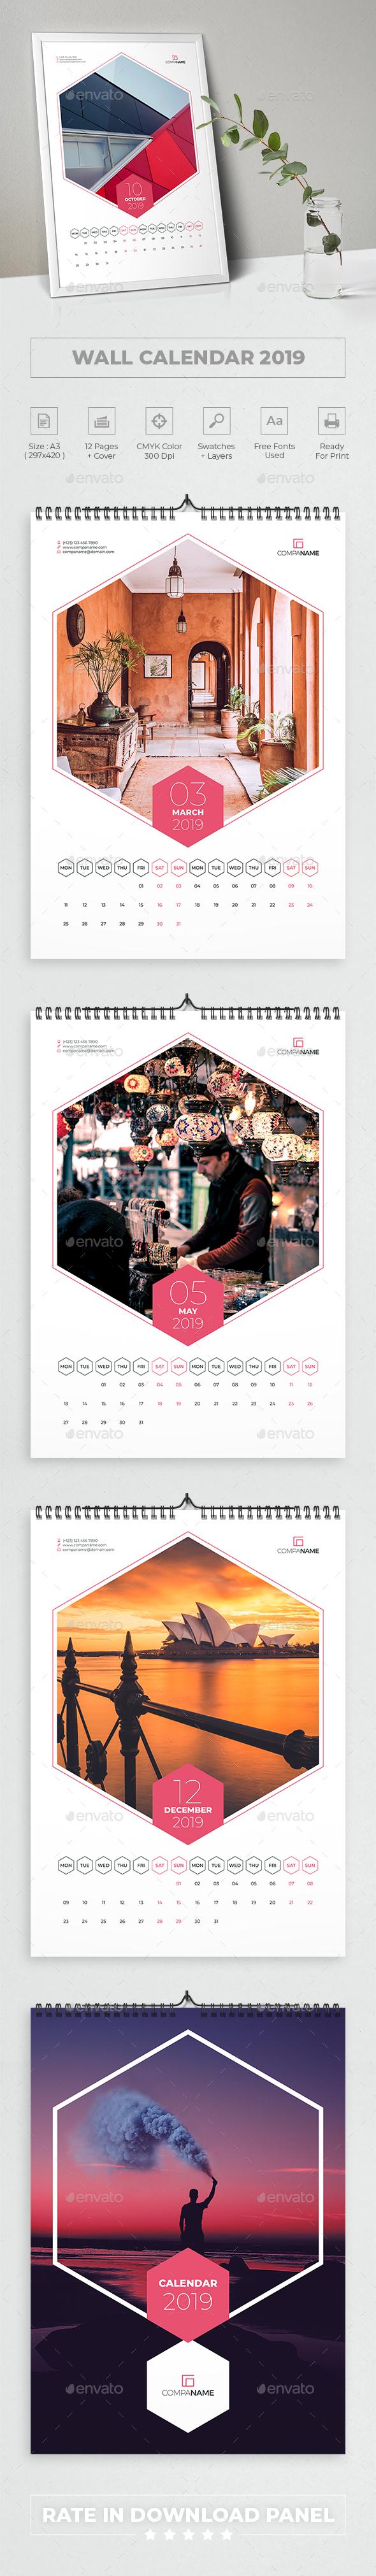 Creative Wall Calendar 2019 - Calendars Stationery